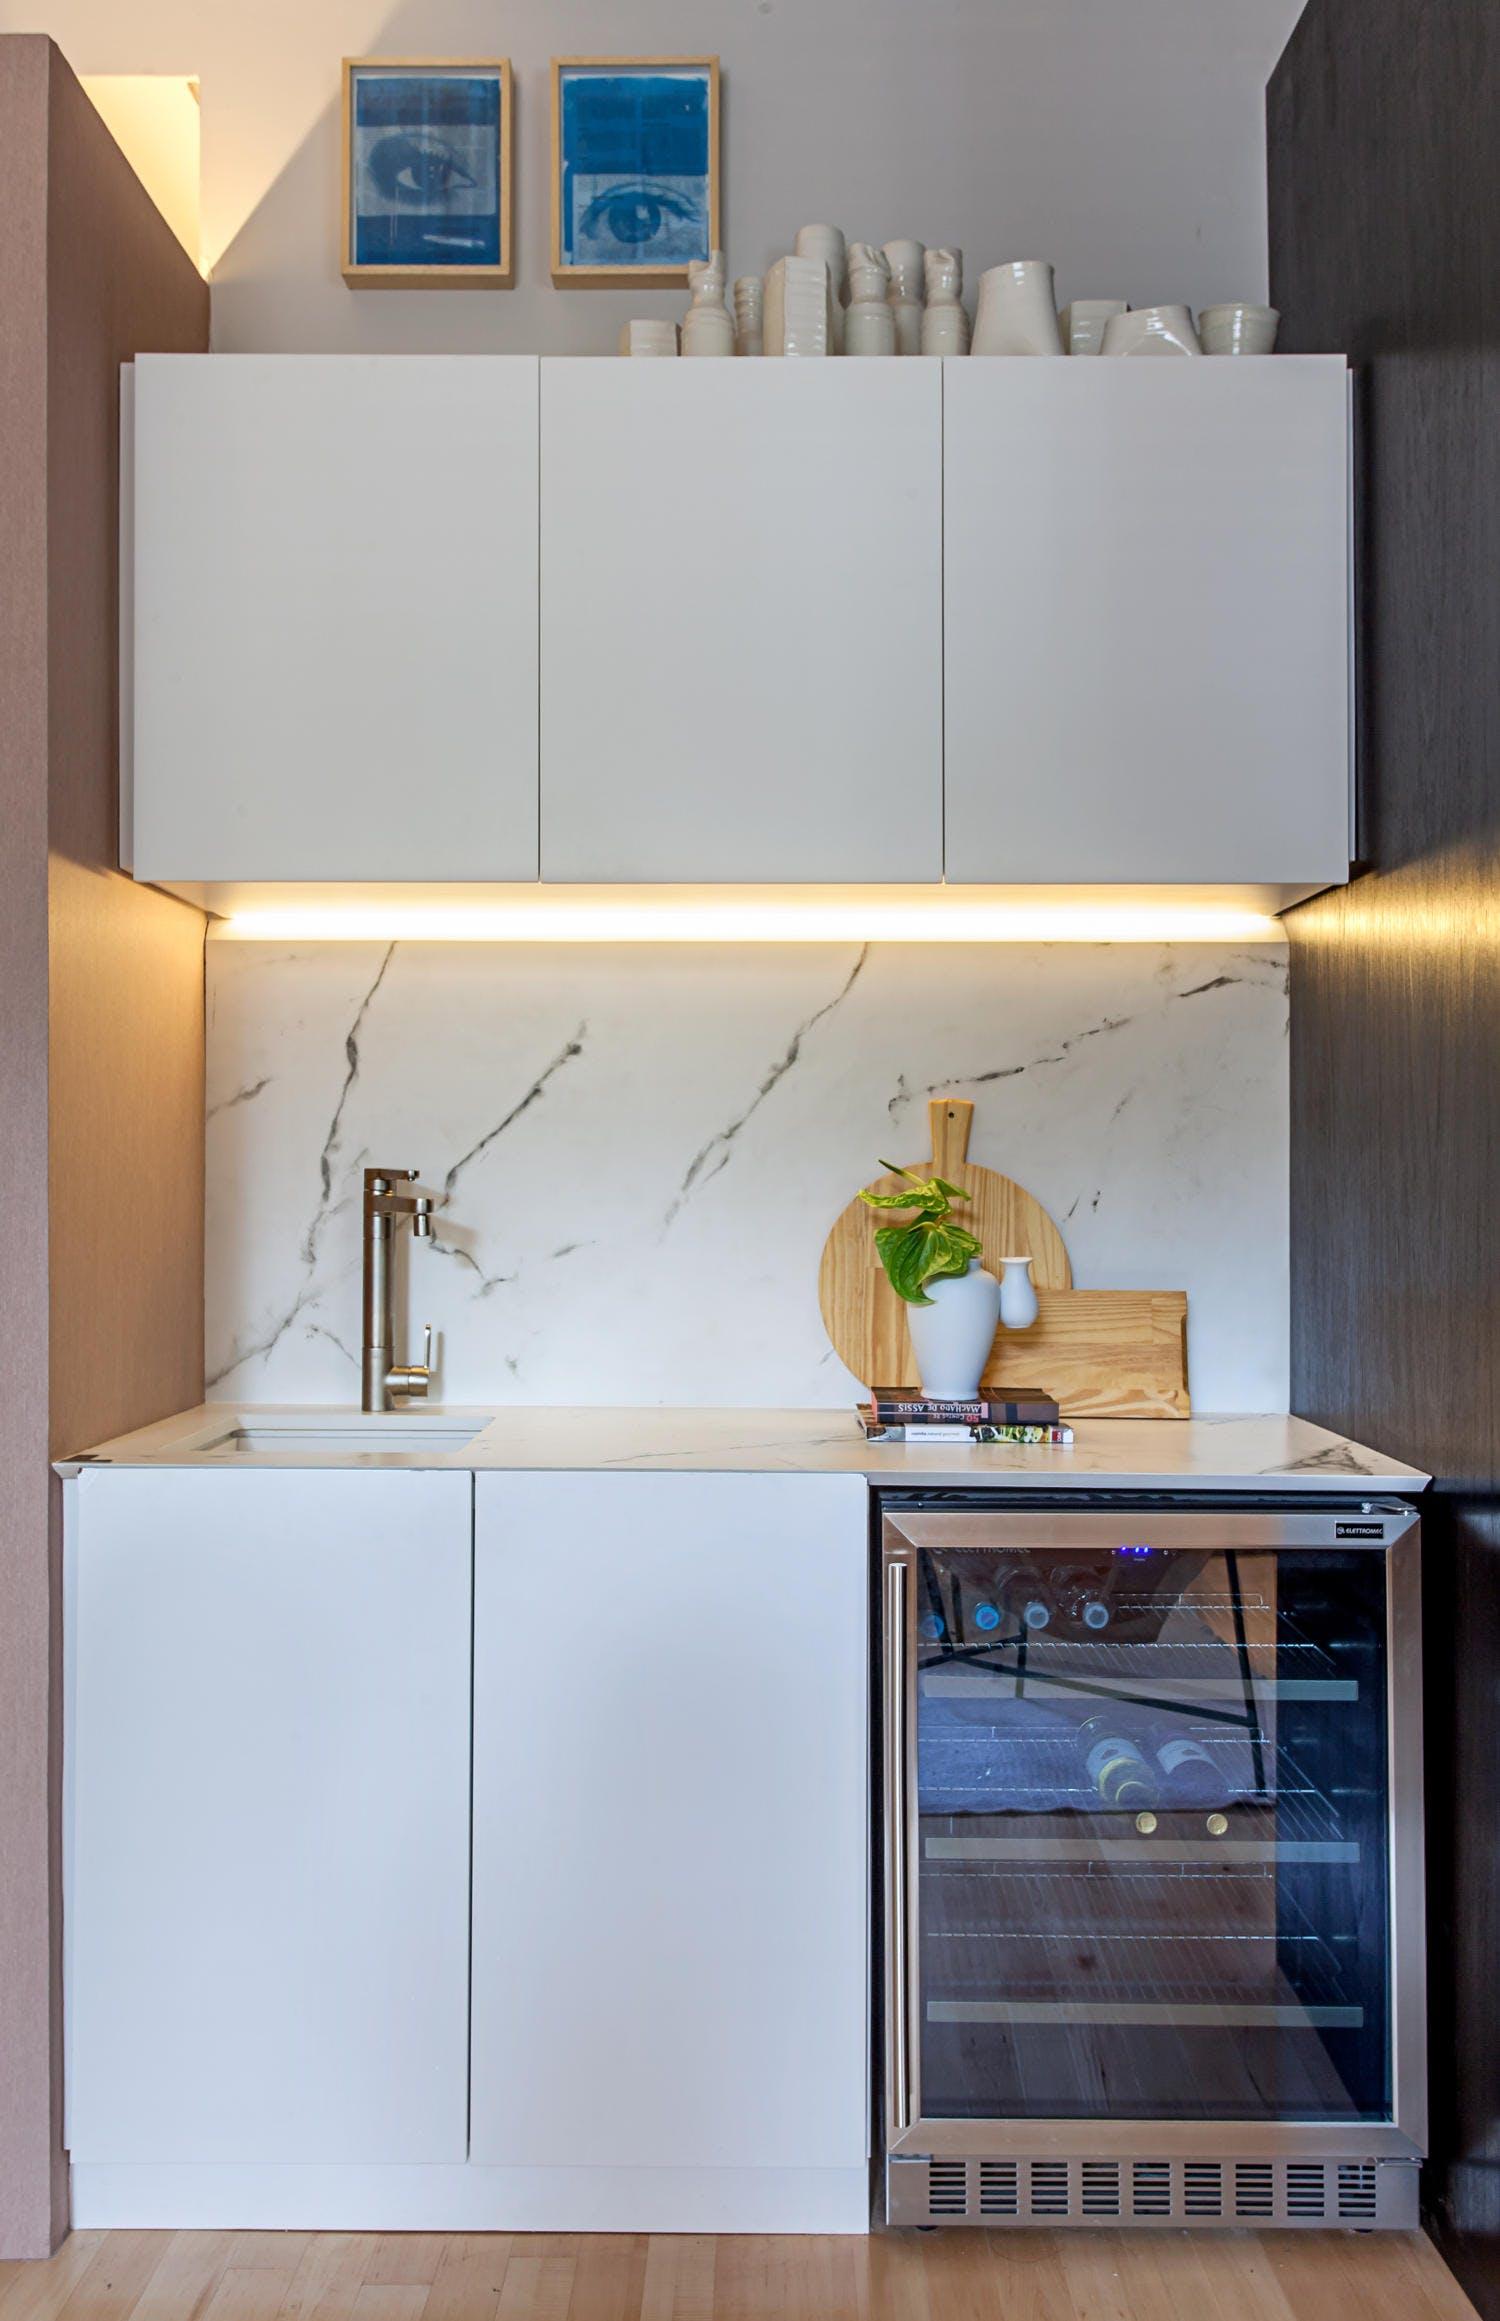 Image of DEKTON KAIROS COPYRIGHT CARLOS PIRATININGA 1 in Compact kitchens: Who says they're a disadvantage? - Cosentino